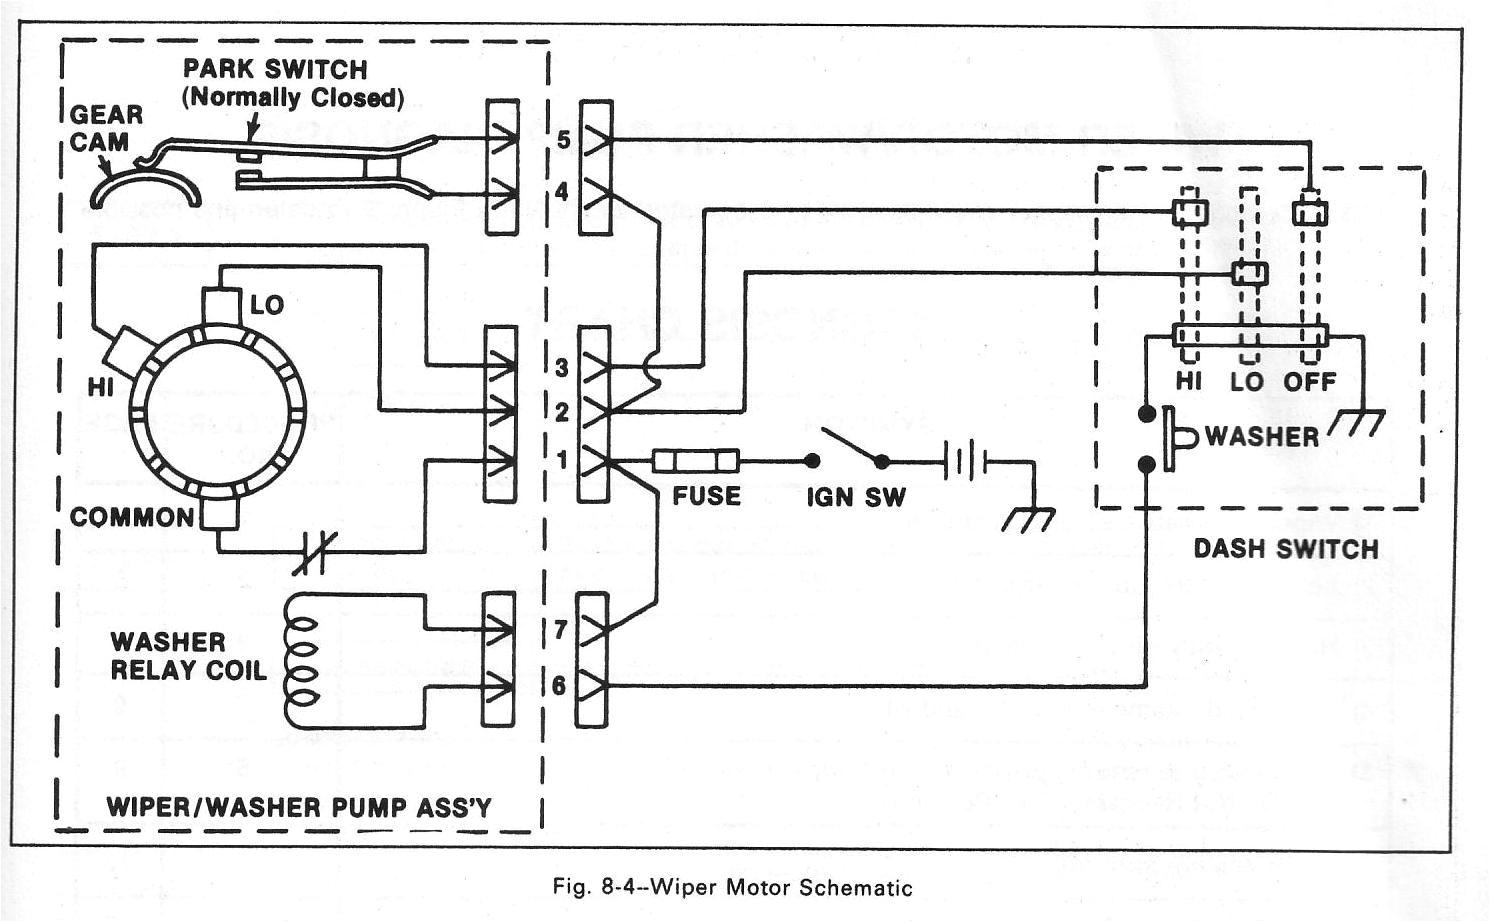 wiper motor wiring diagram 85 ford data wiring diagram 1982 ford wiper motor wiring wiring diagram